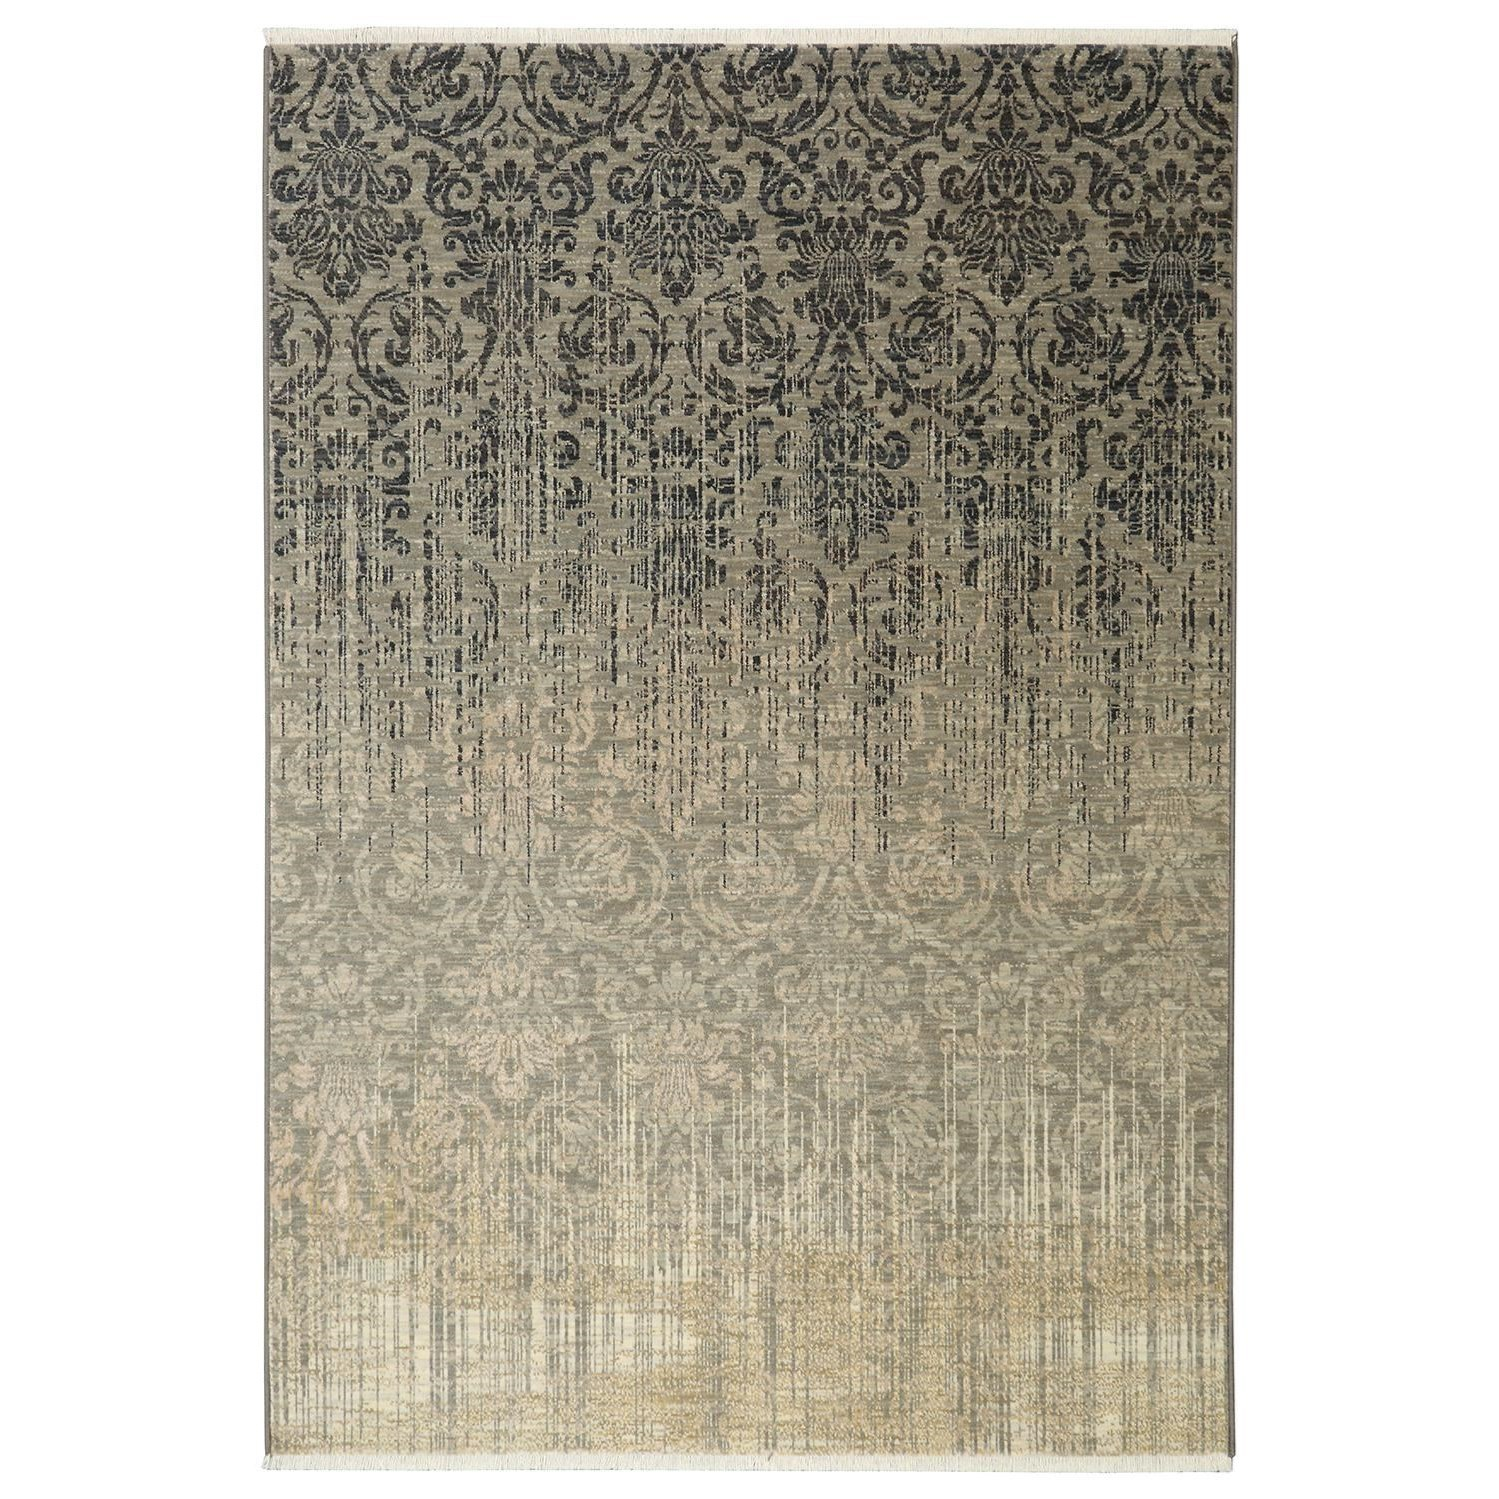 Titanium 5'3x7'10 Tiberio Gray Rug by Karastan Rugs at Darvin Furniture